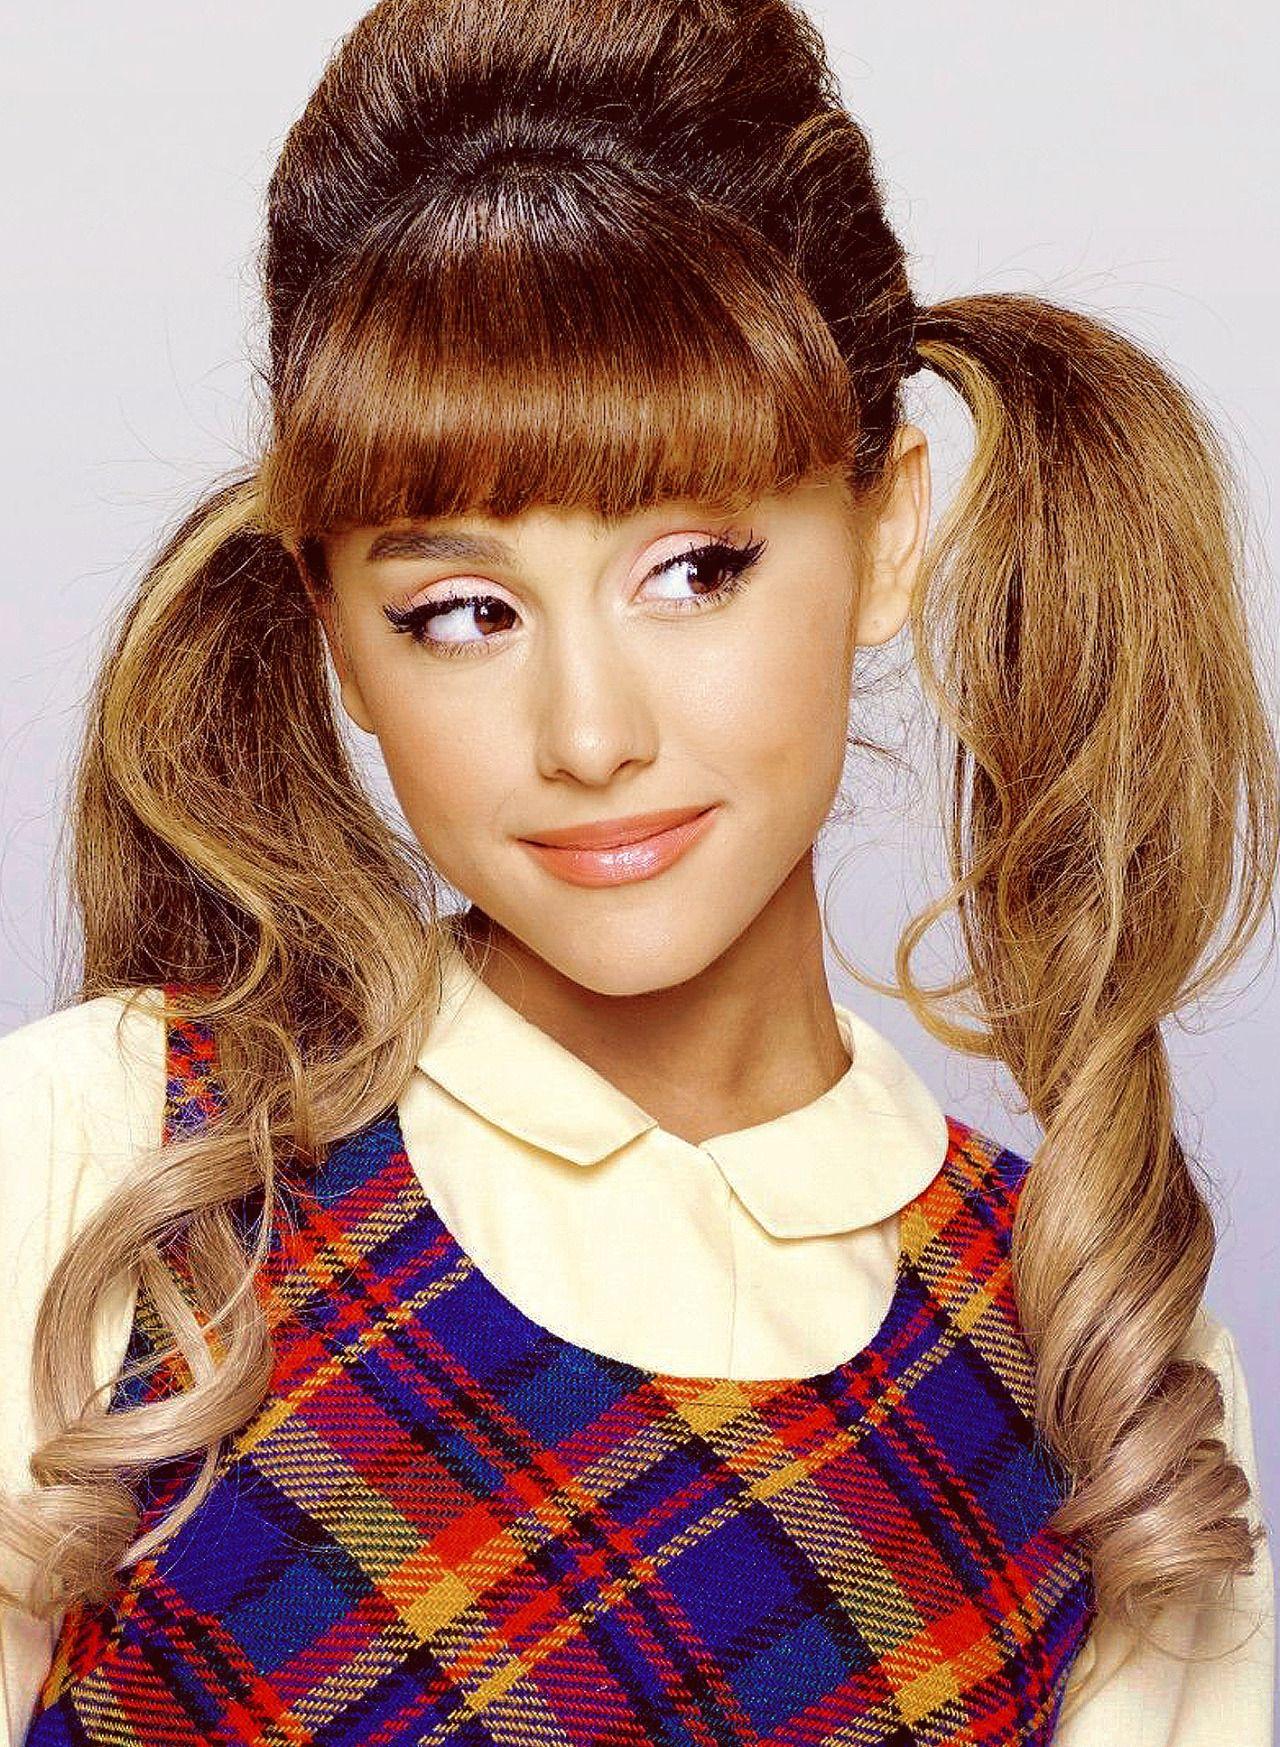 Promo nbc s hairspray live ariana grande cf pinterest coiffures - Ariana grande coiffure ...